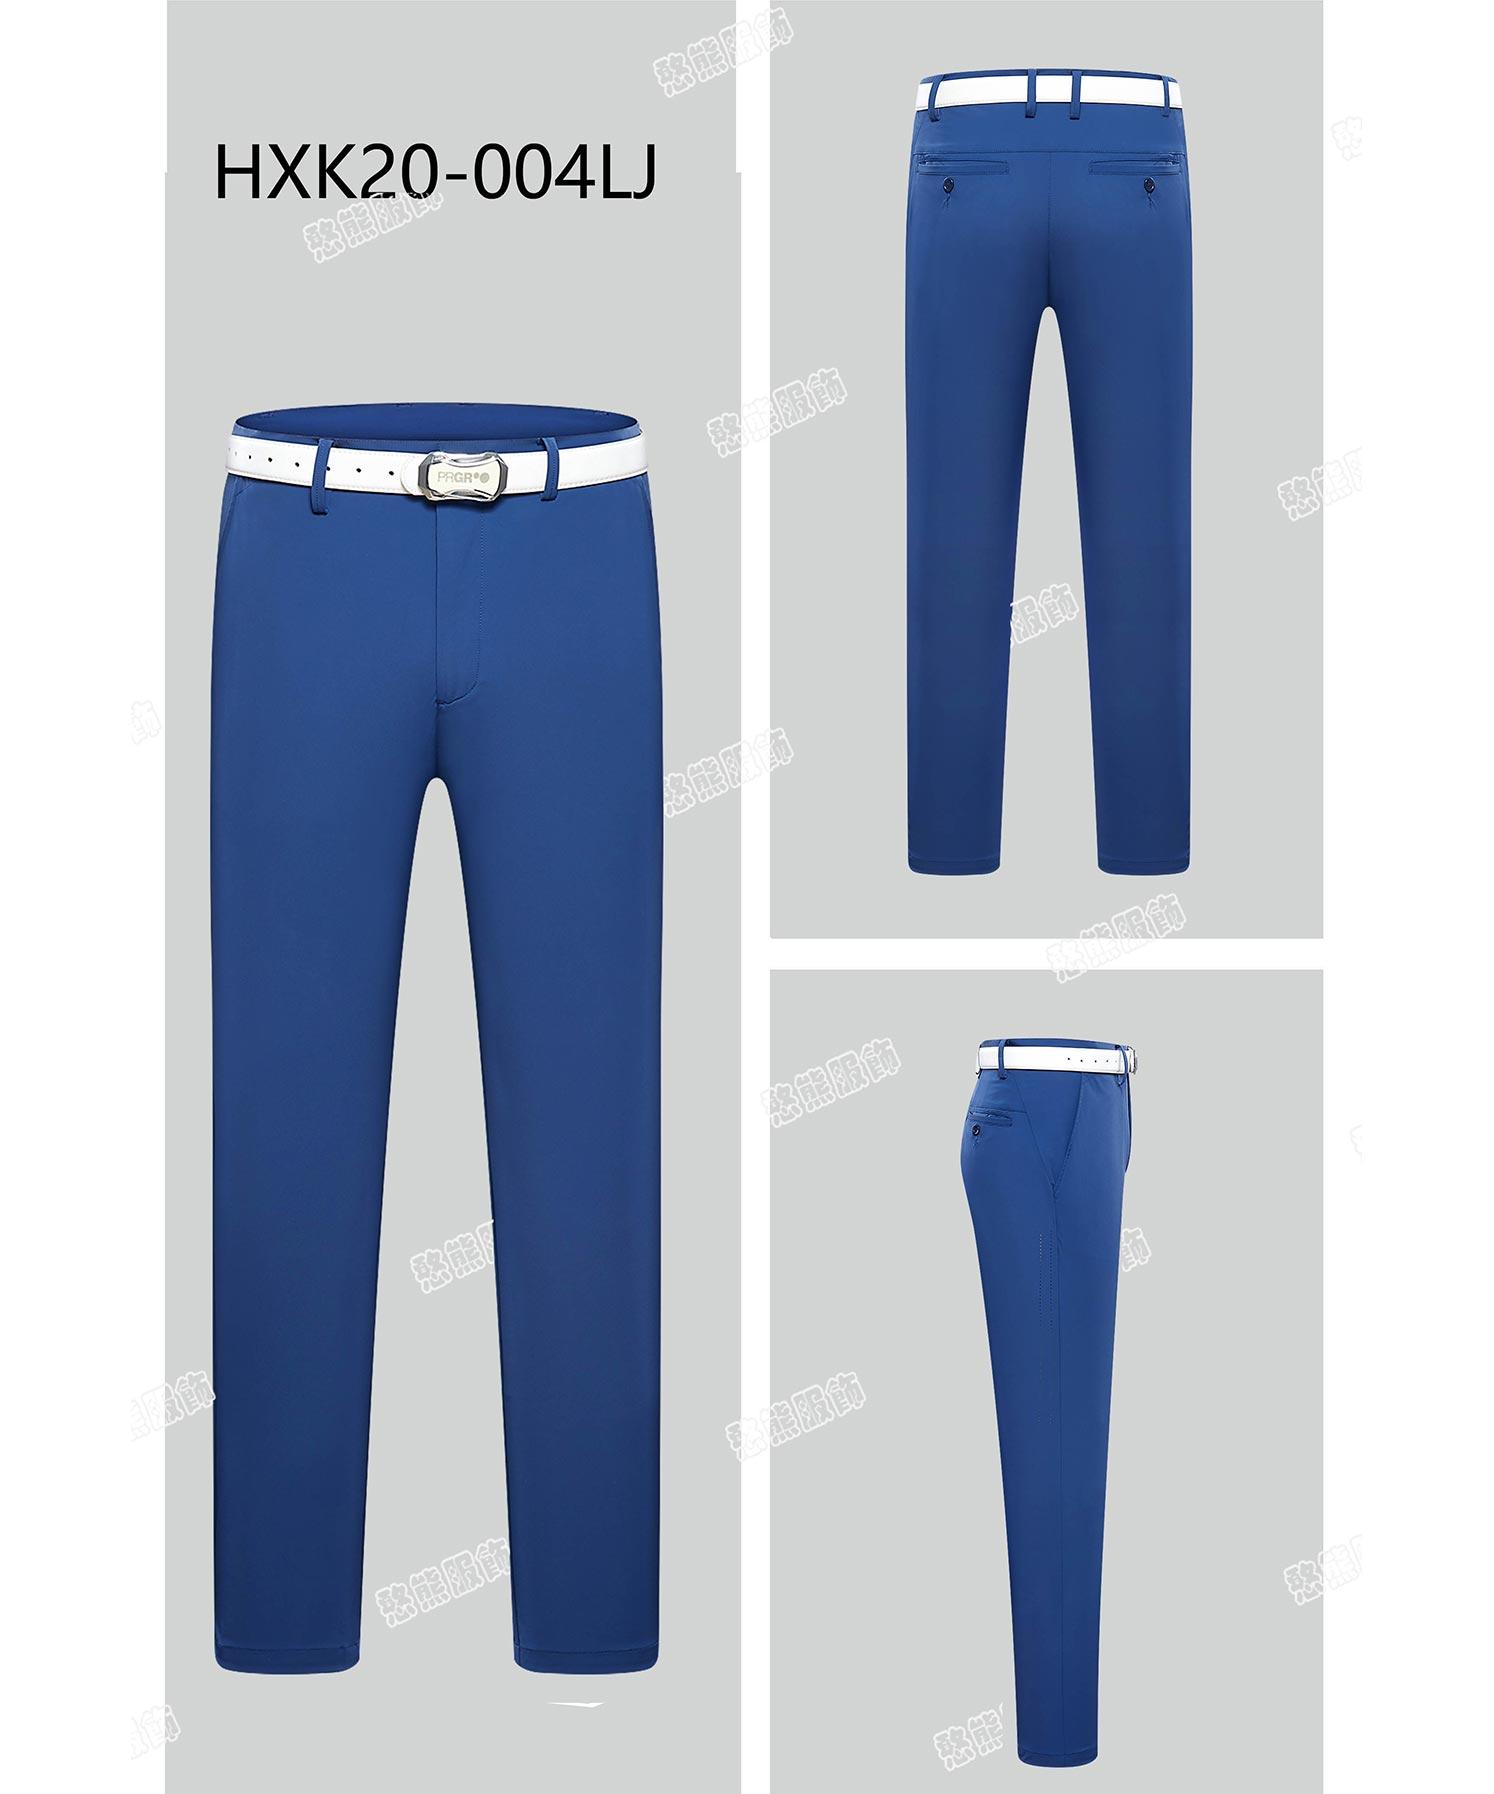 HXK20-004LJ